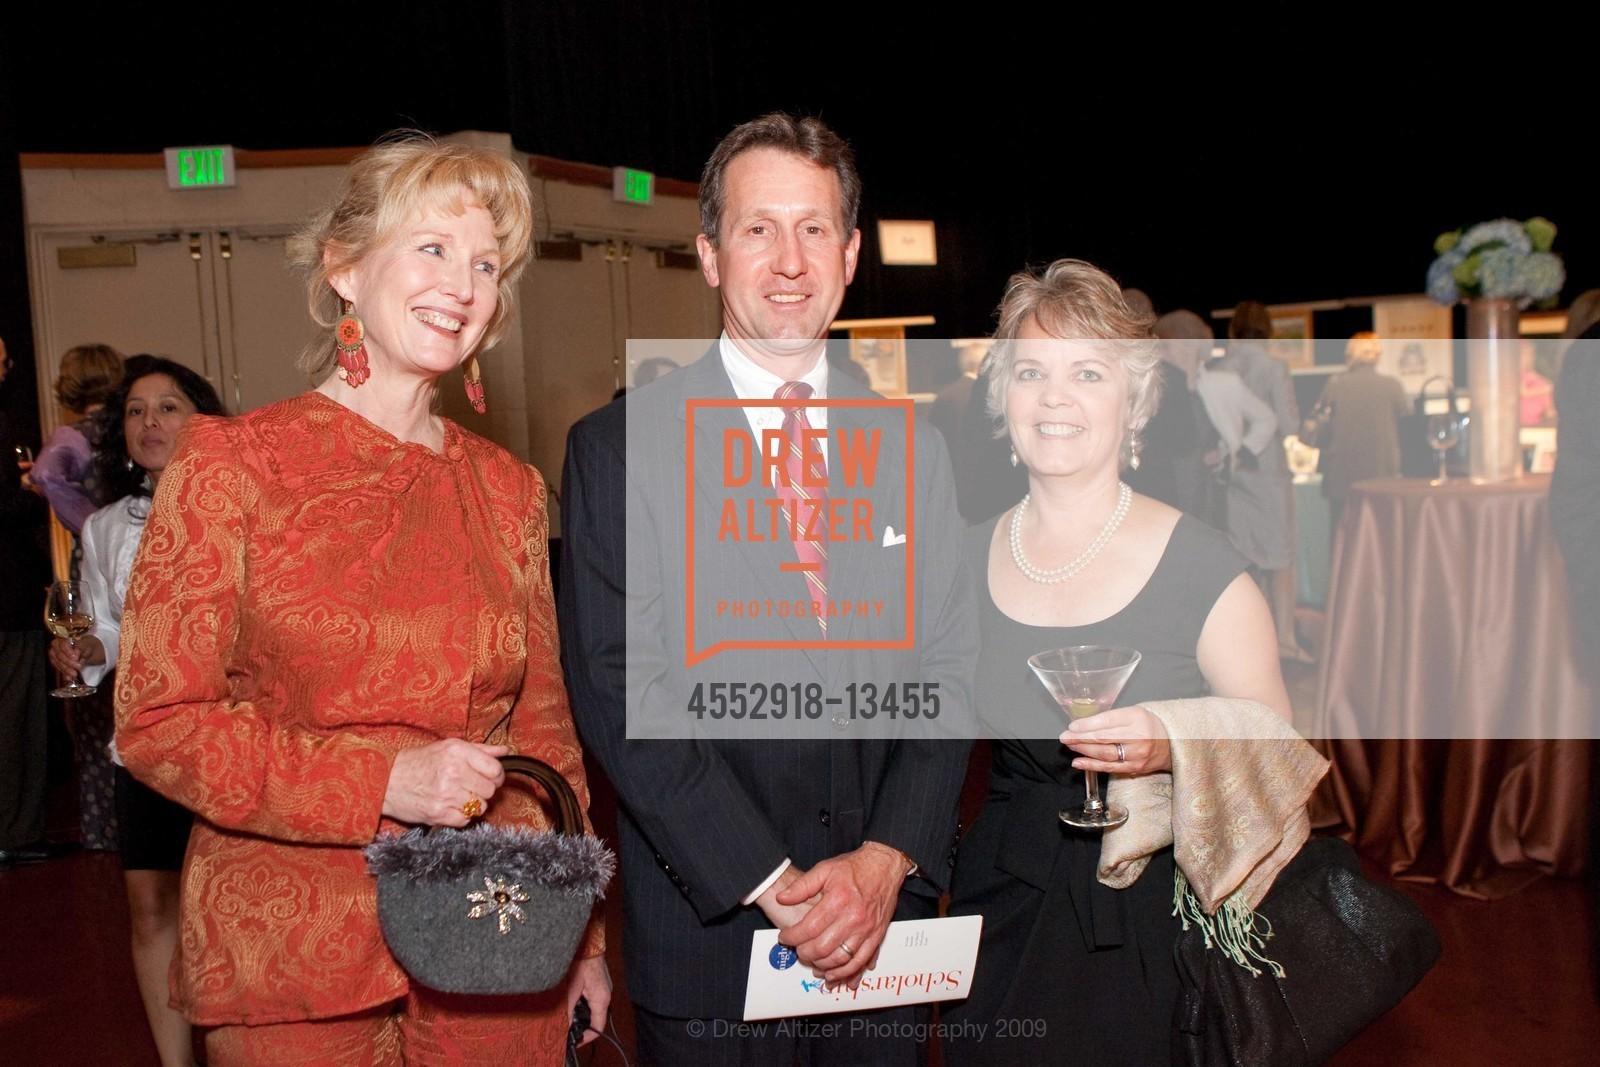 Marty Blum with Kenneth Kushman and Carolyn Muir